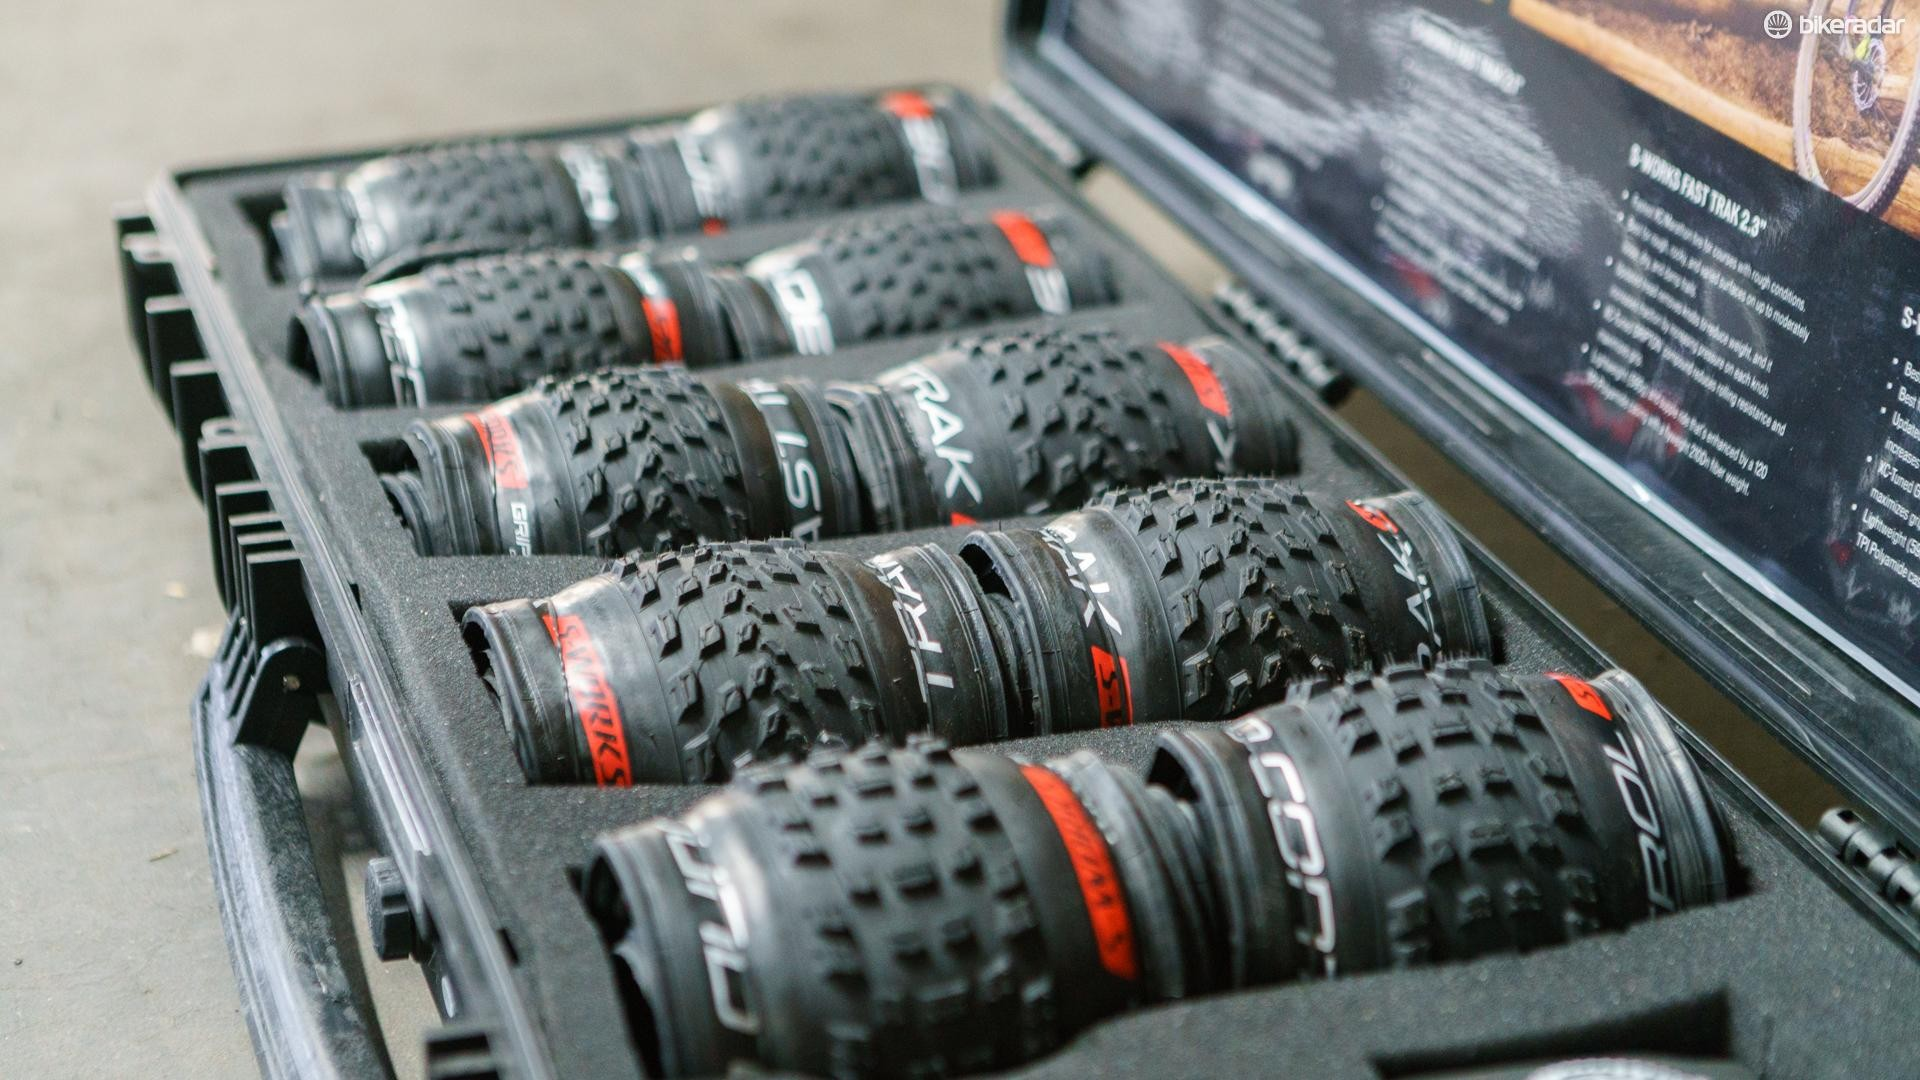 Specialized's new XC tyres